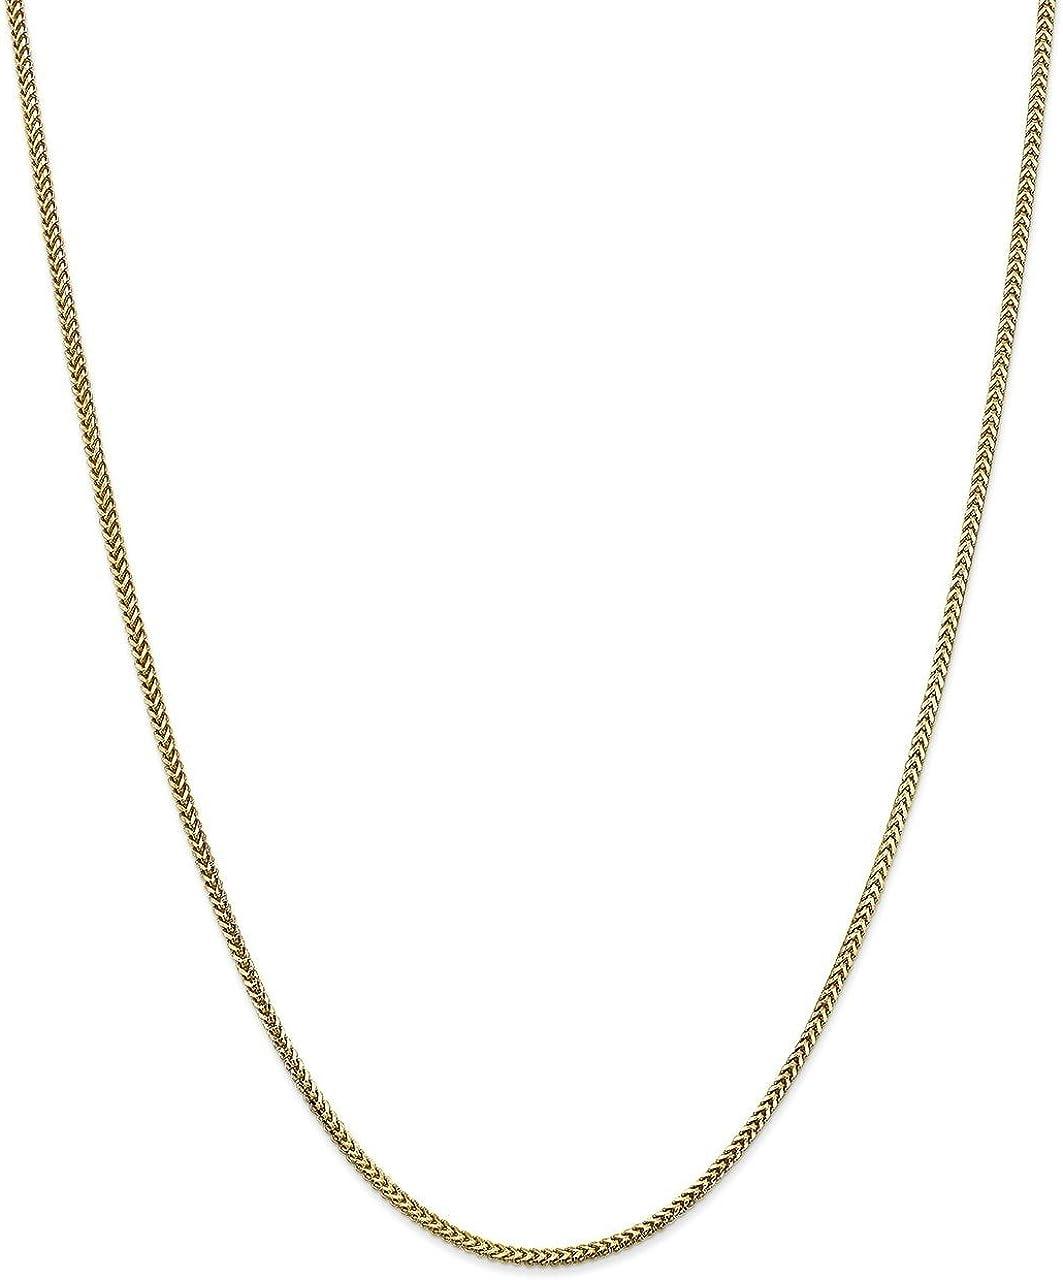 Lex /& Lu 10k Yellow Gold 1.5mm Franco Chain Bracelet or Necklace